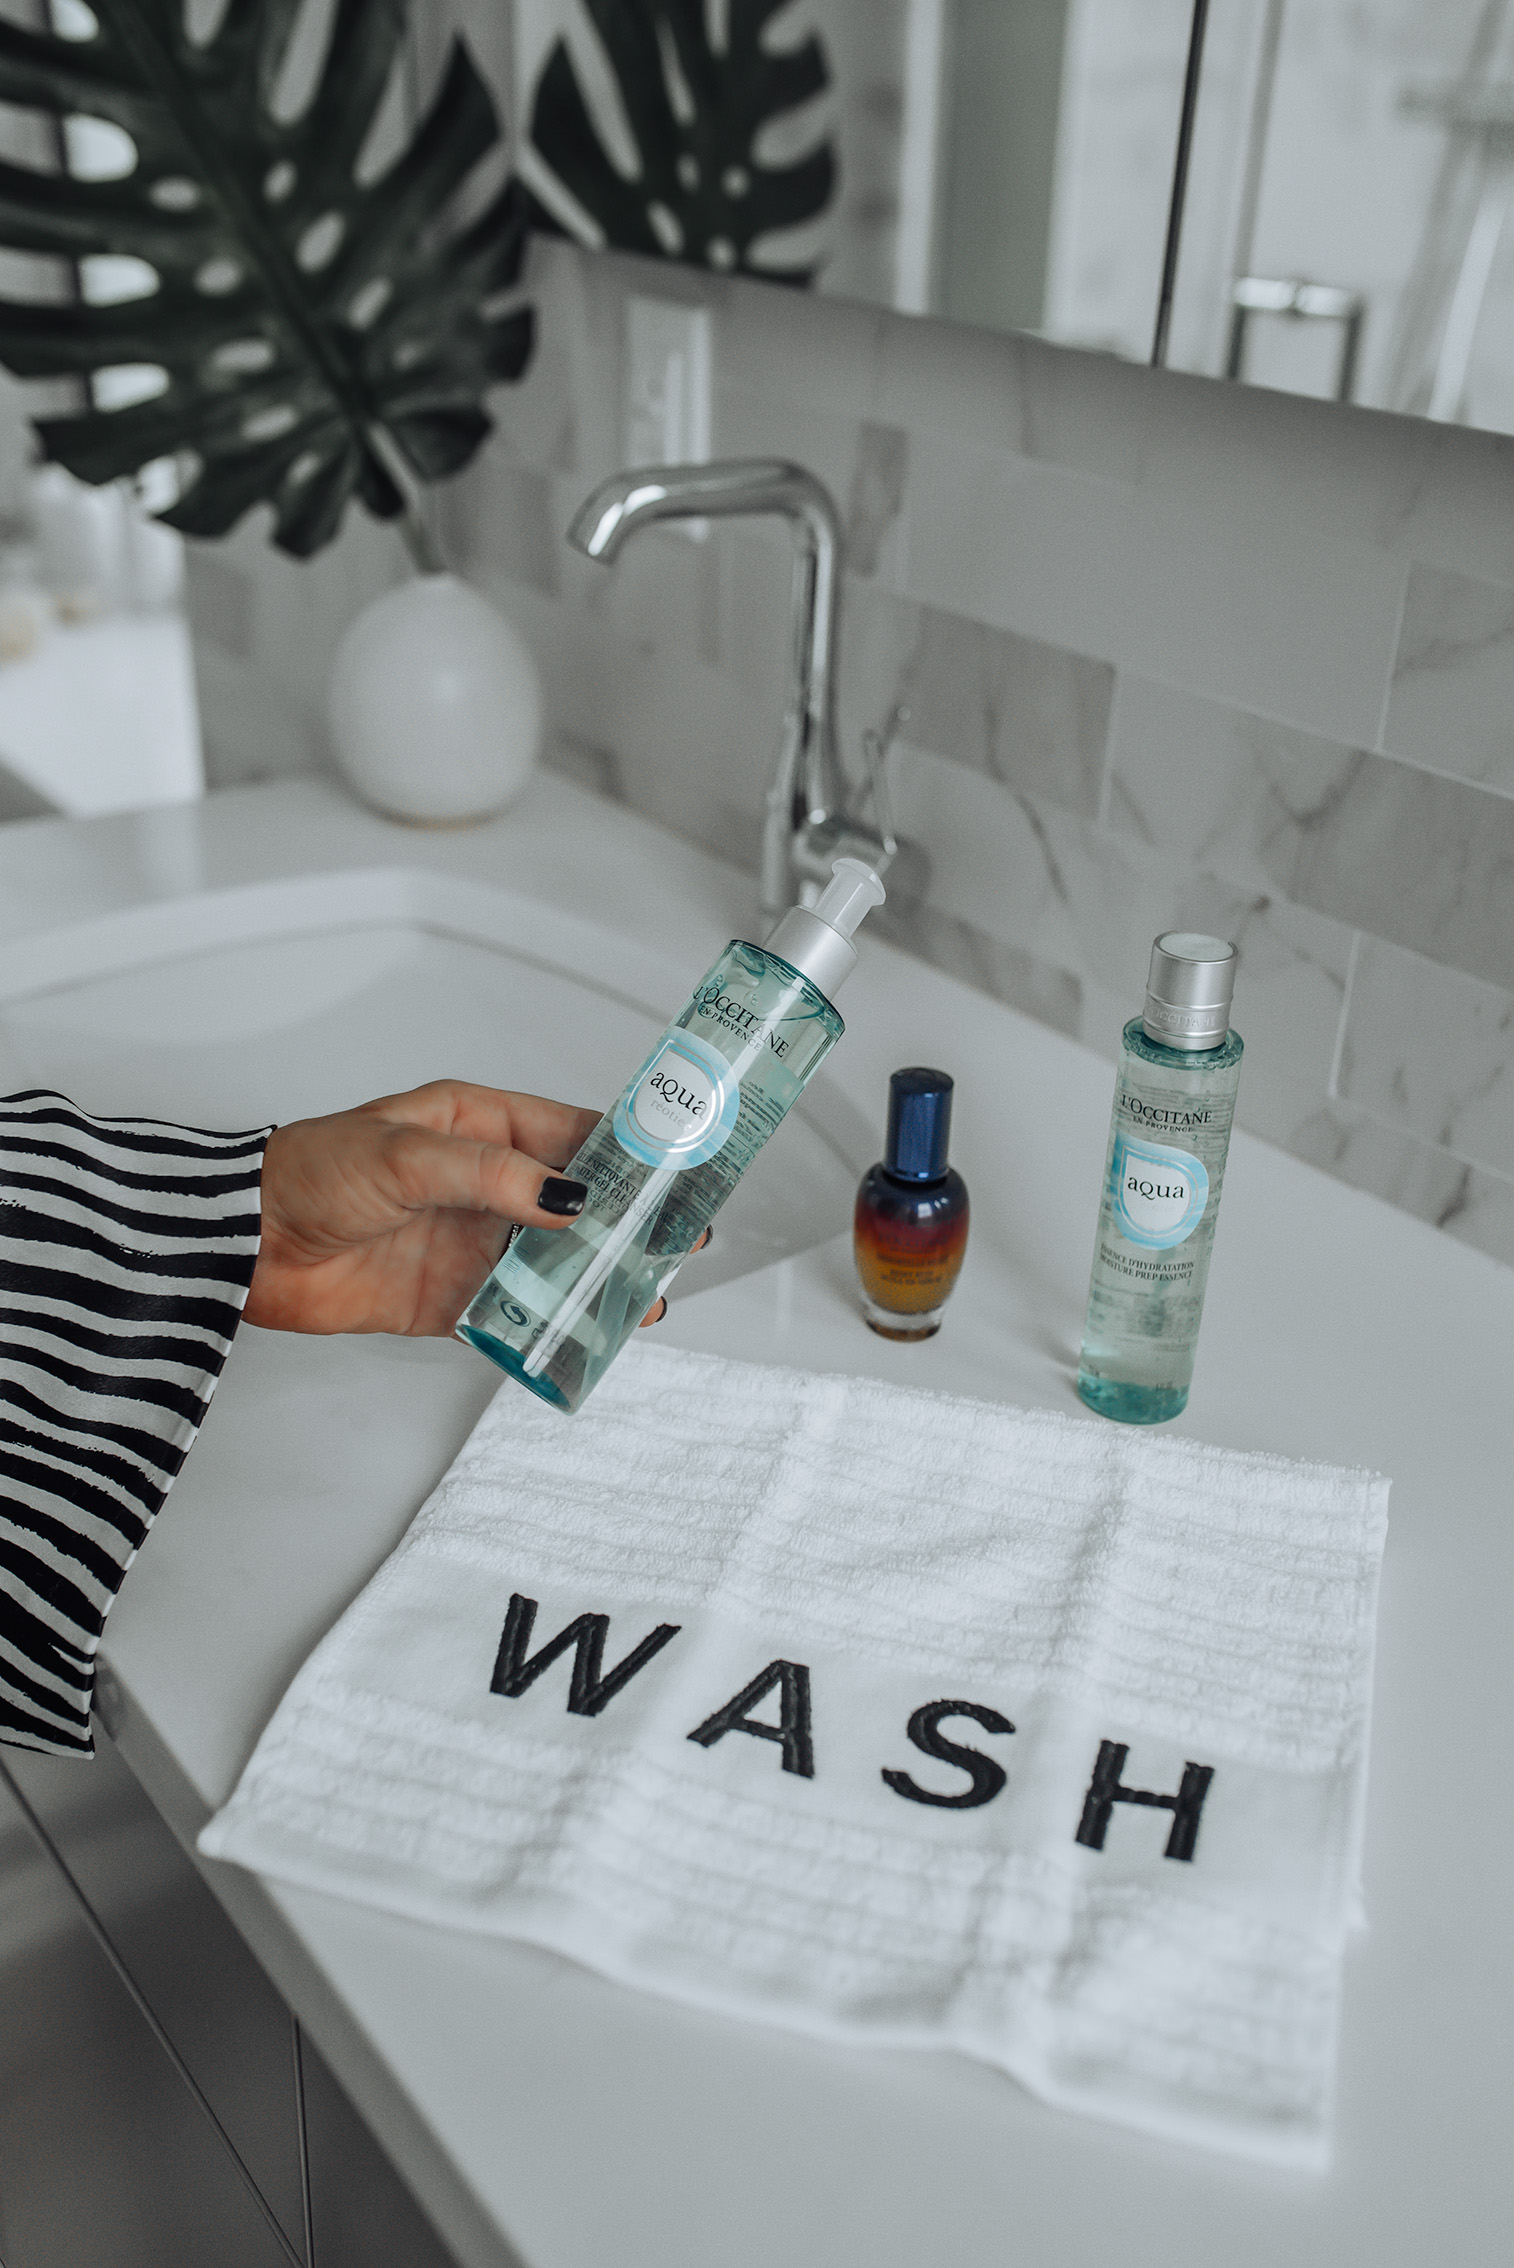 Reset your skincare with L'Occitane |Aqua Reotier Water Gel Cleanser | Aqua Reotier Moisture Prep Essence | Overnight Reset Oil-In-Serum #beautyproducts #pregnancysafeskincare